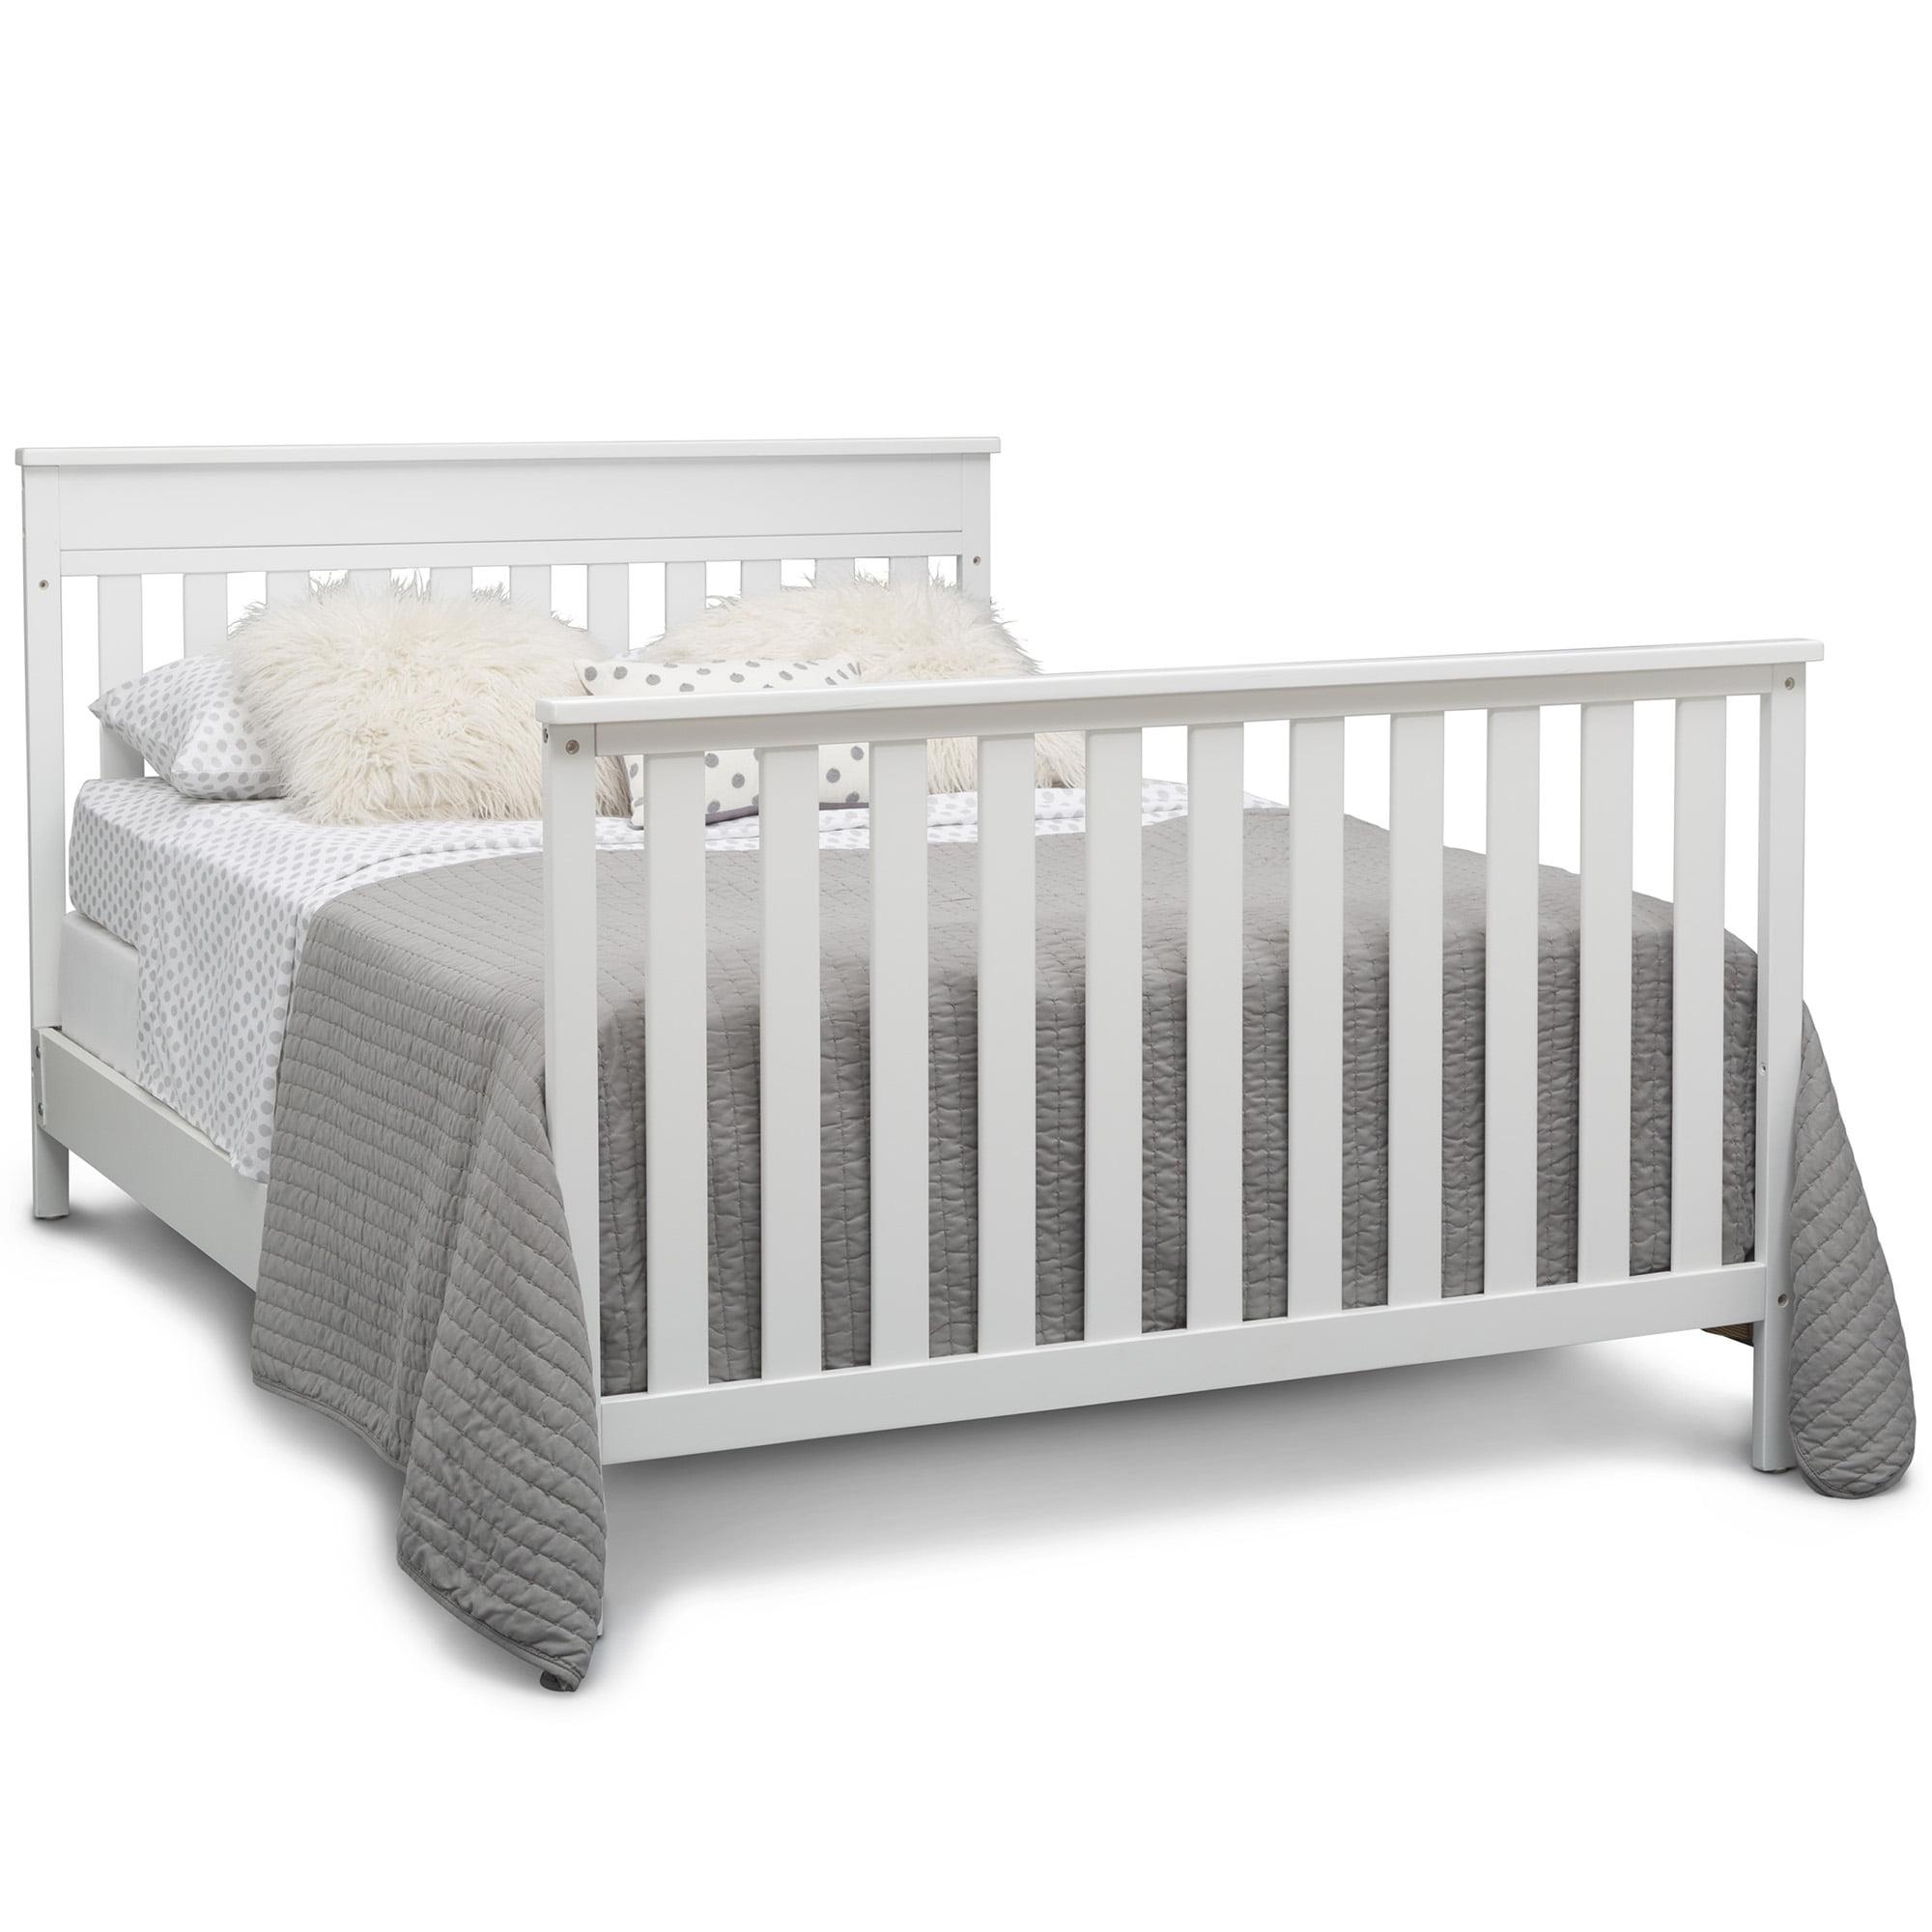 Delta Children Kingswood 4 In 1 Convertible Baby Crib Bianca White Walmart Com Walmart Com